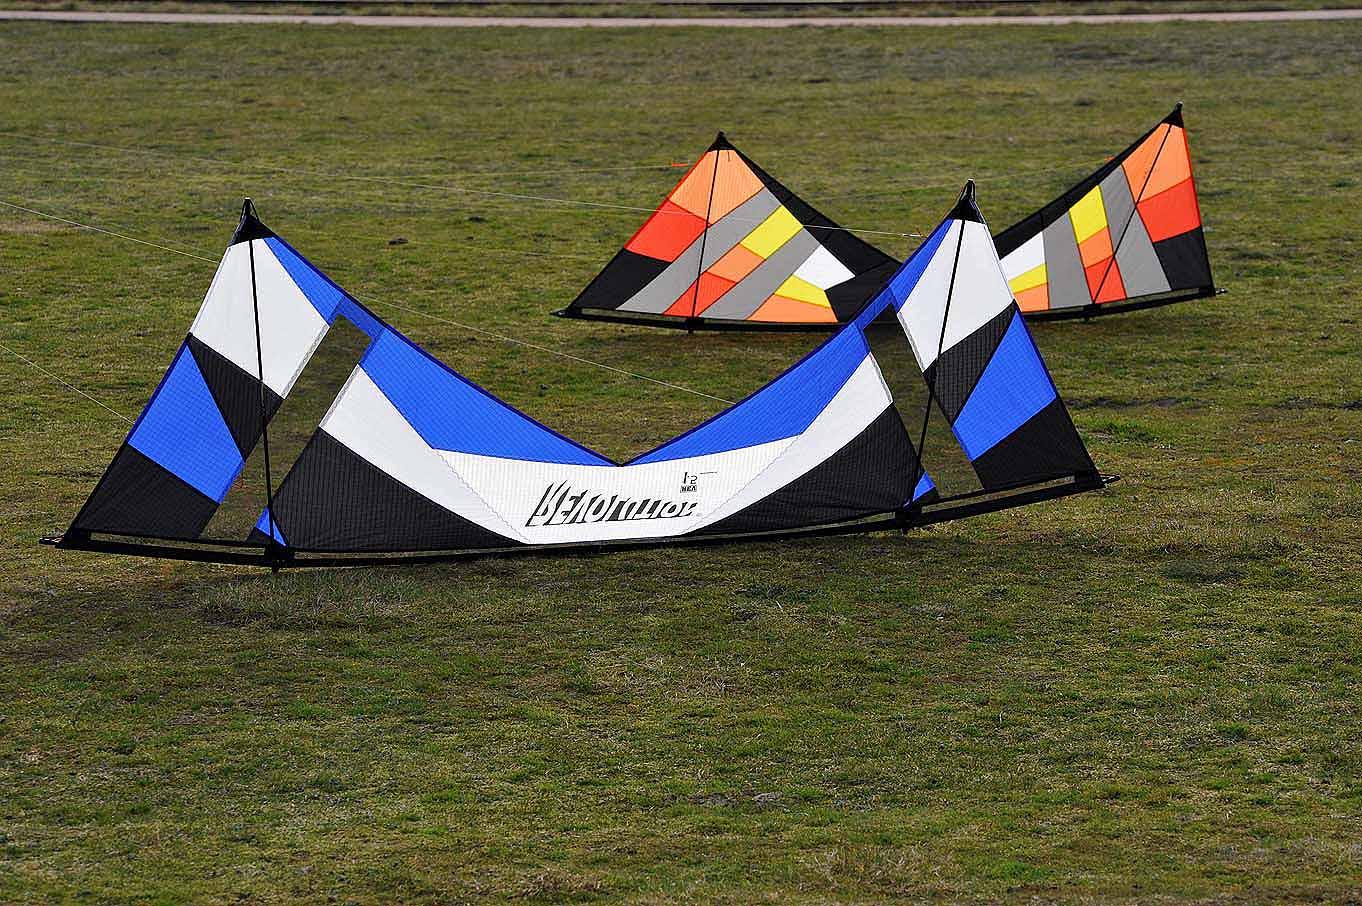 Dou van Rev kites